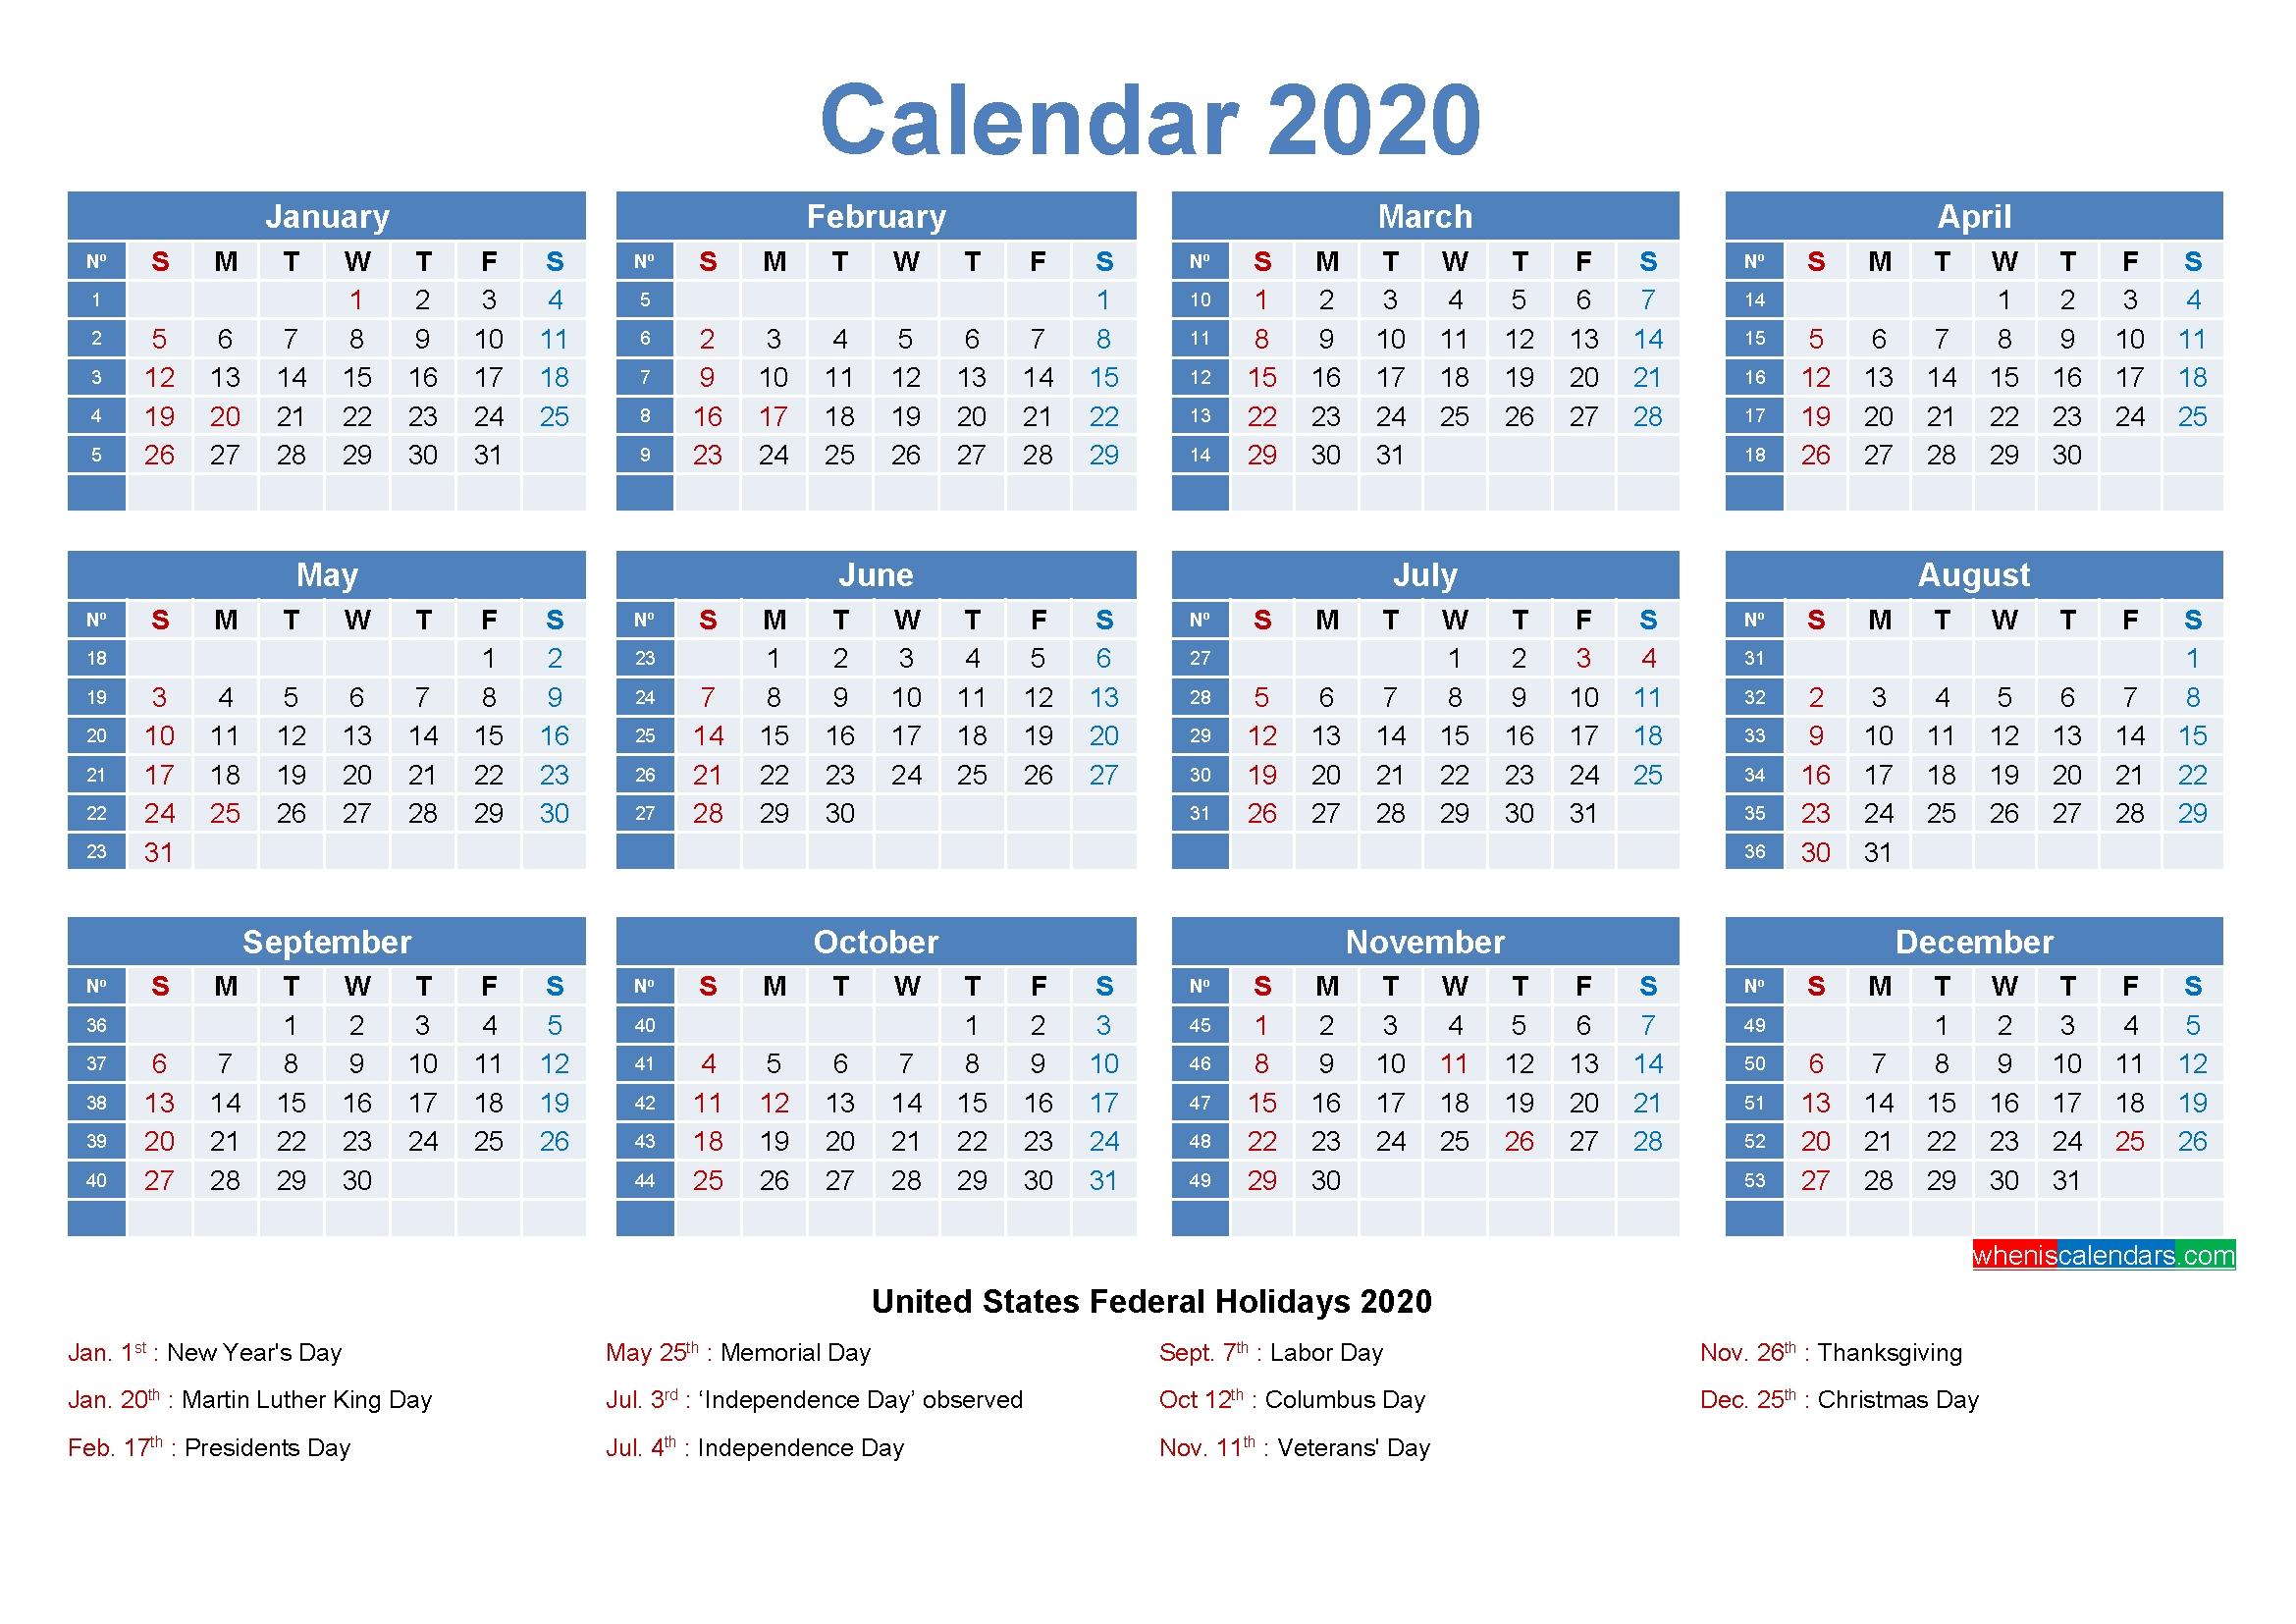 Editable Printable Calendar 2020 Word - Template No.ep20Y8 with 2020 Calendar With Week Numbers Printable